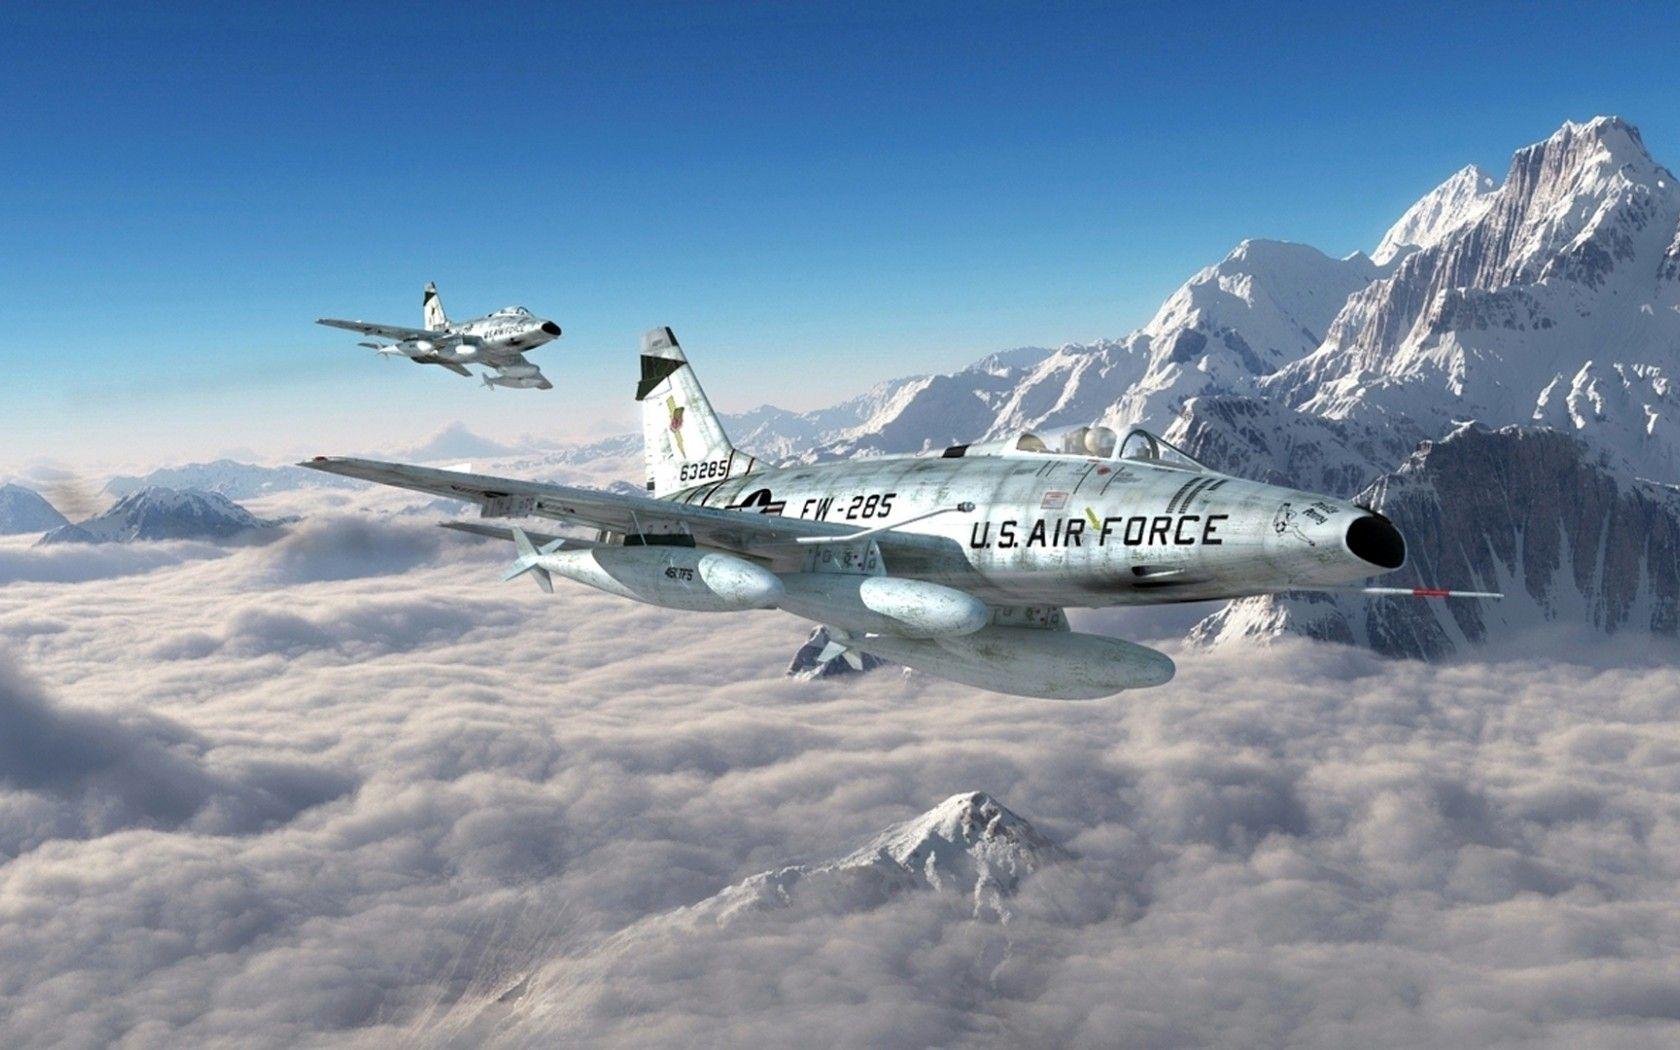 North American F100 Super Sabre | Обои картинки фото north american, f-100, super sabre